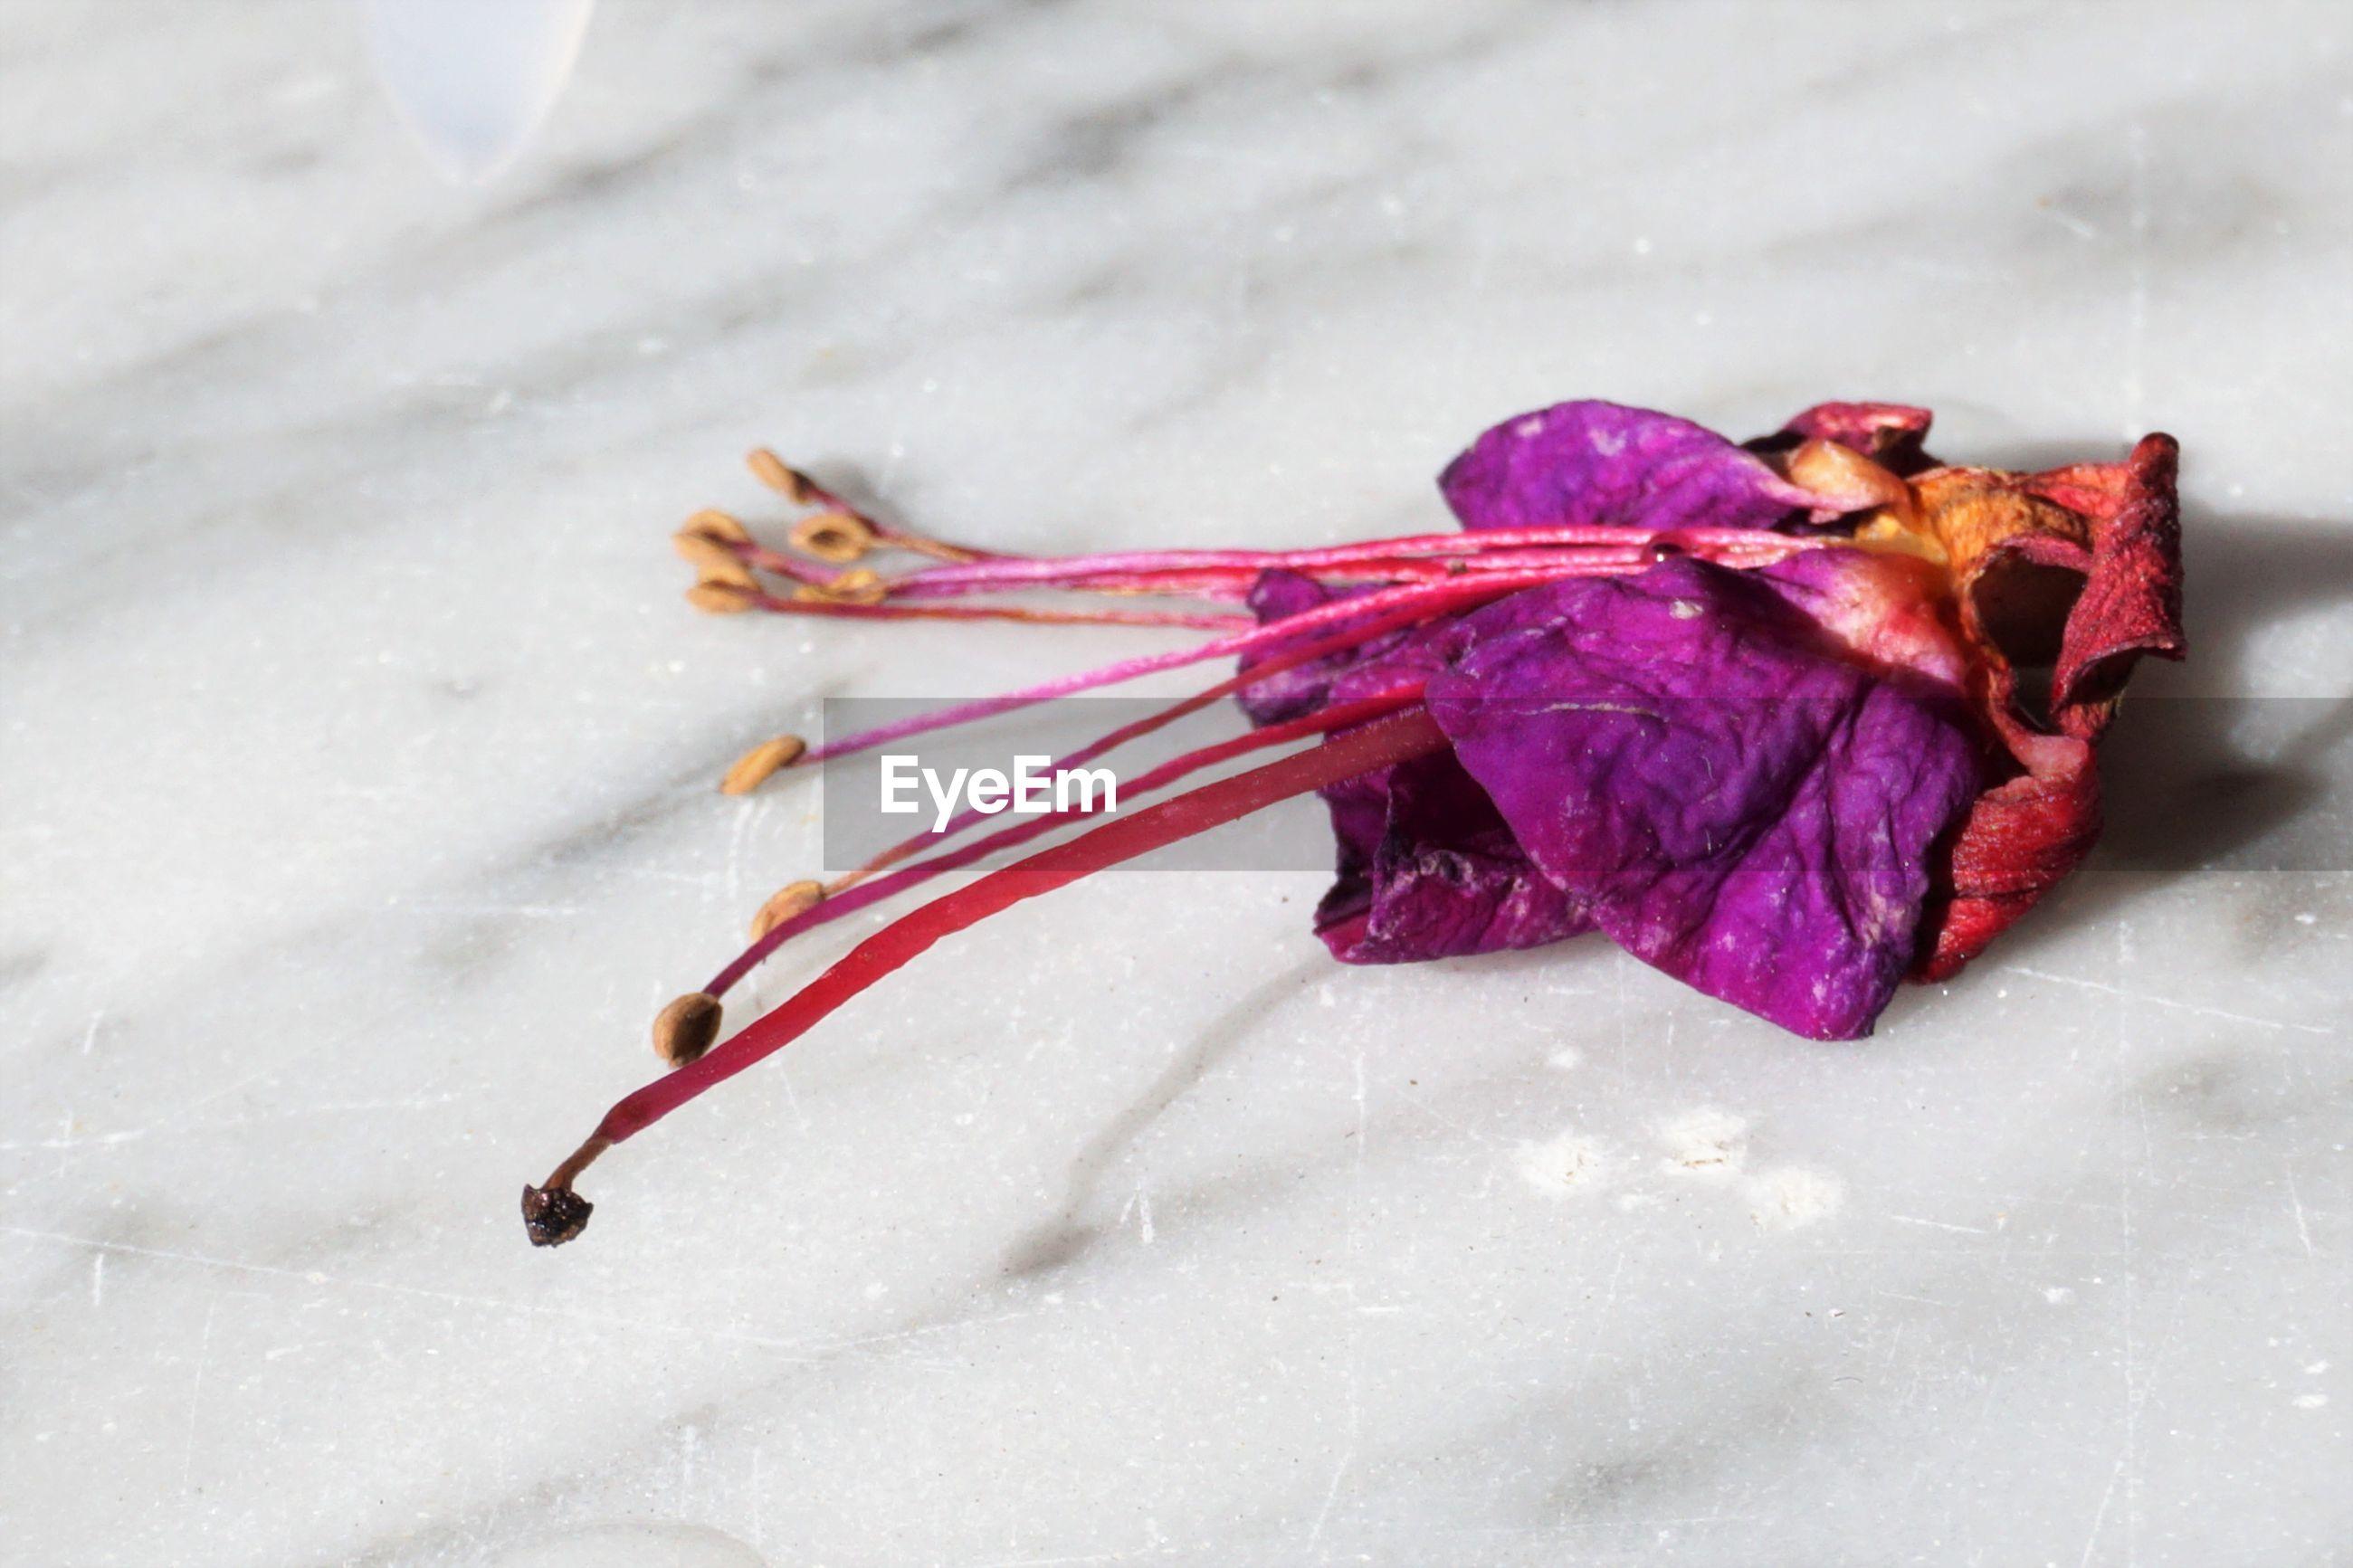 High angle view of a fallen flower